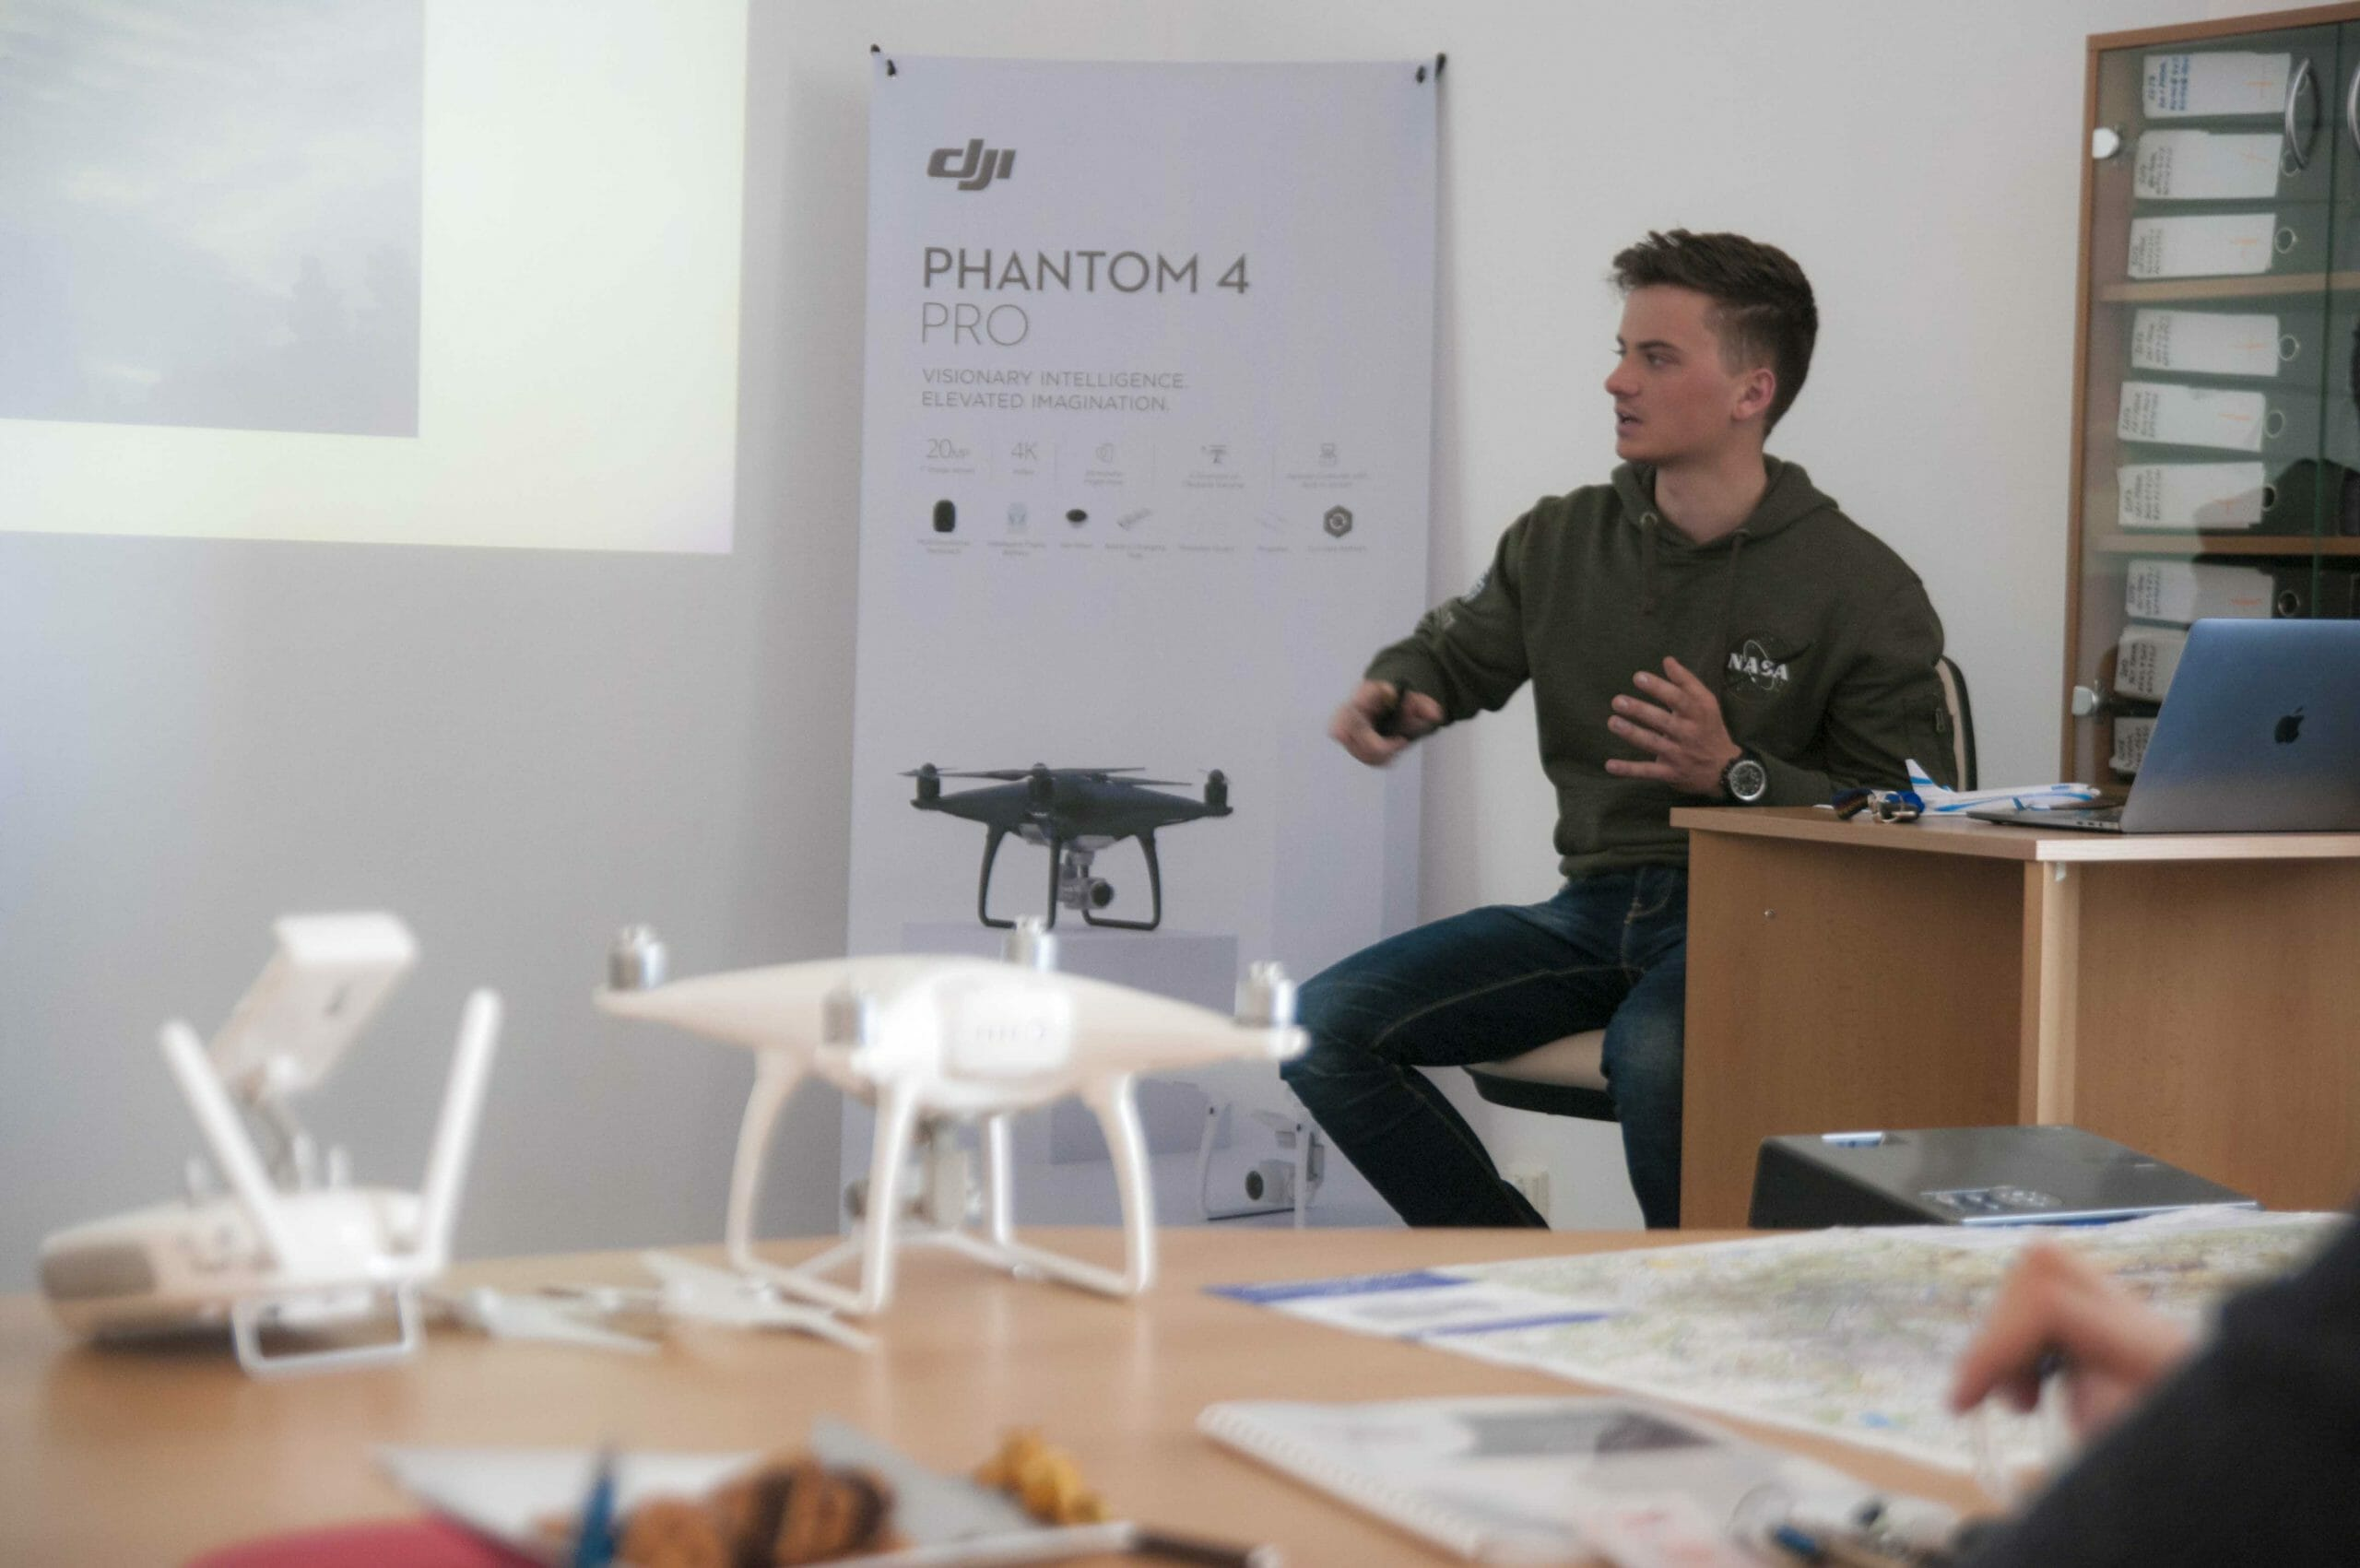 teoretický kurz s dronom online